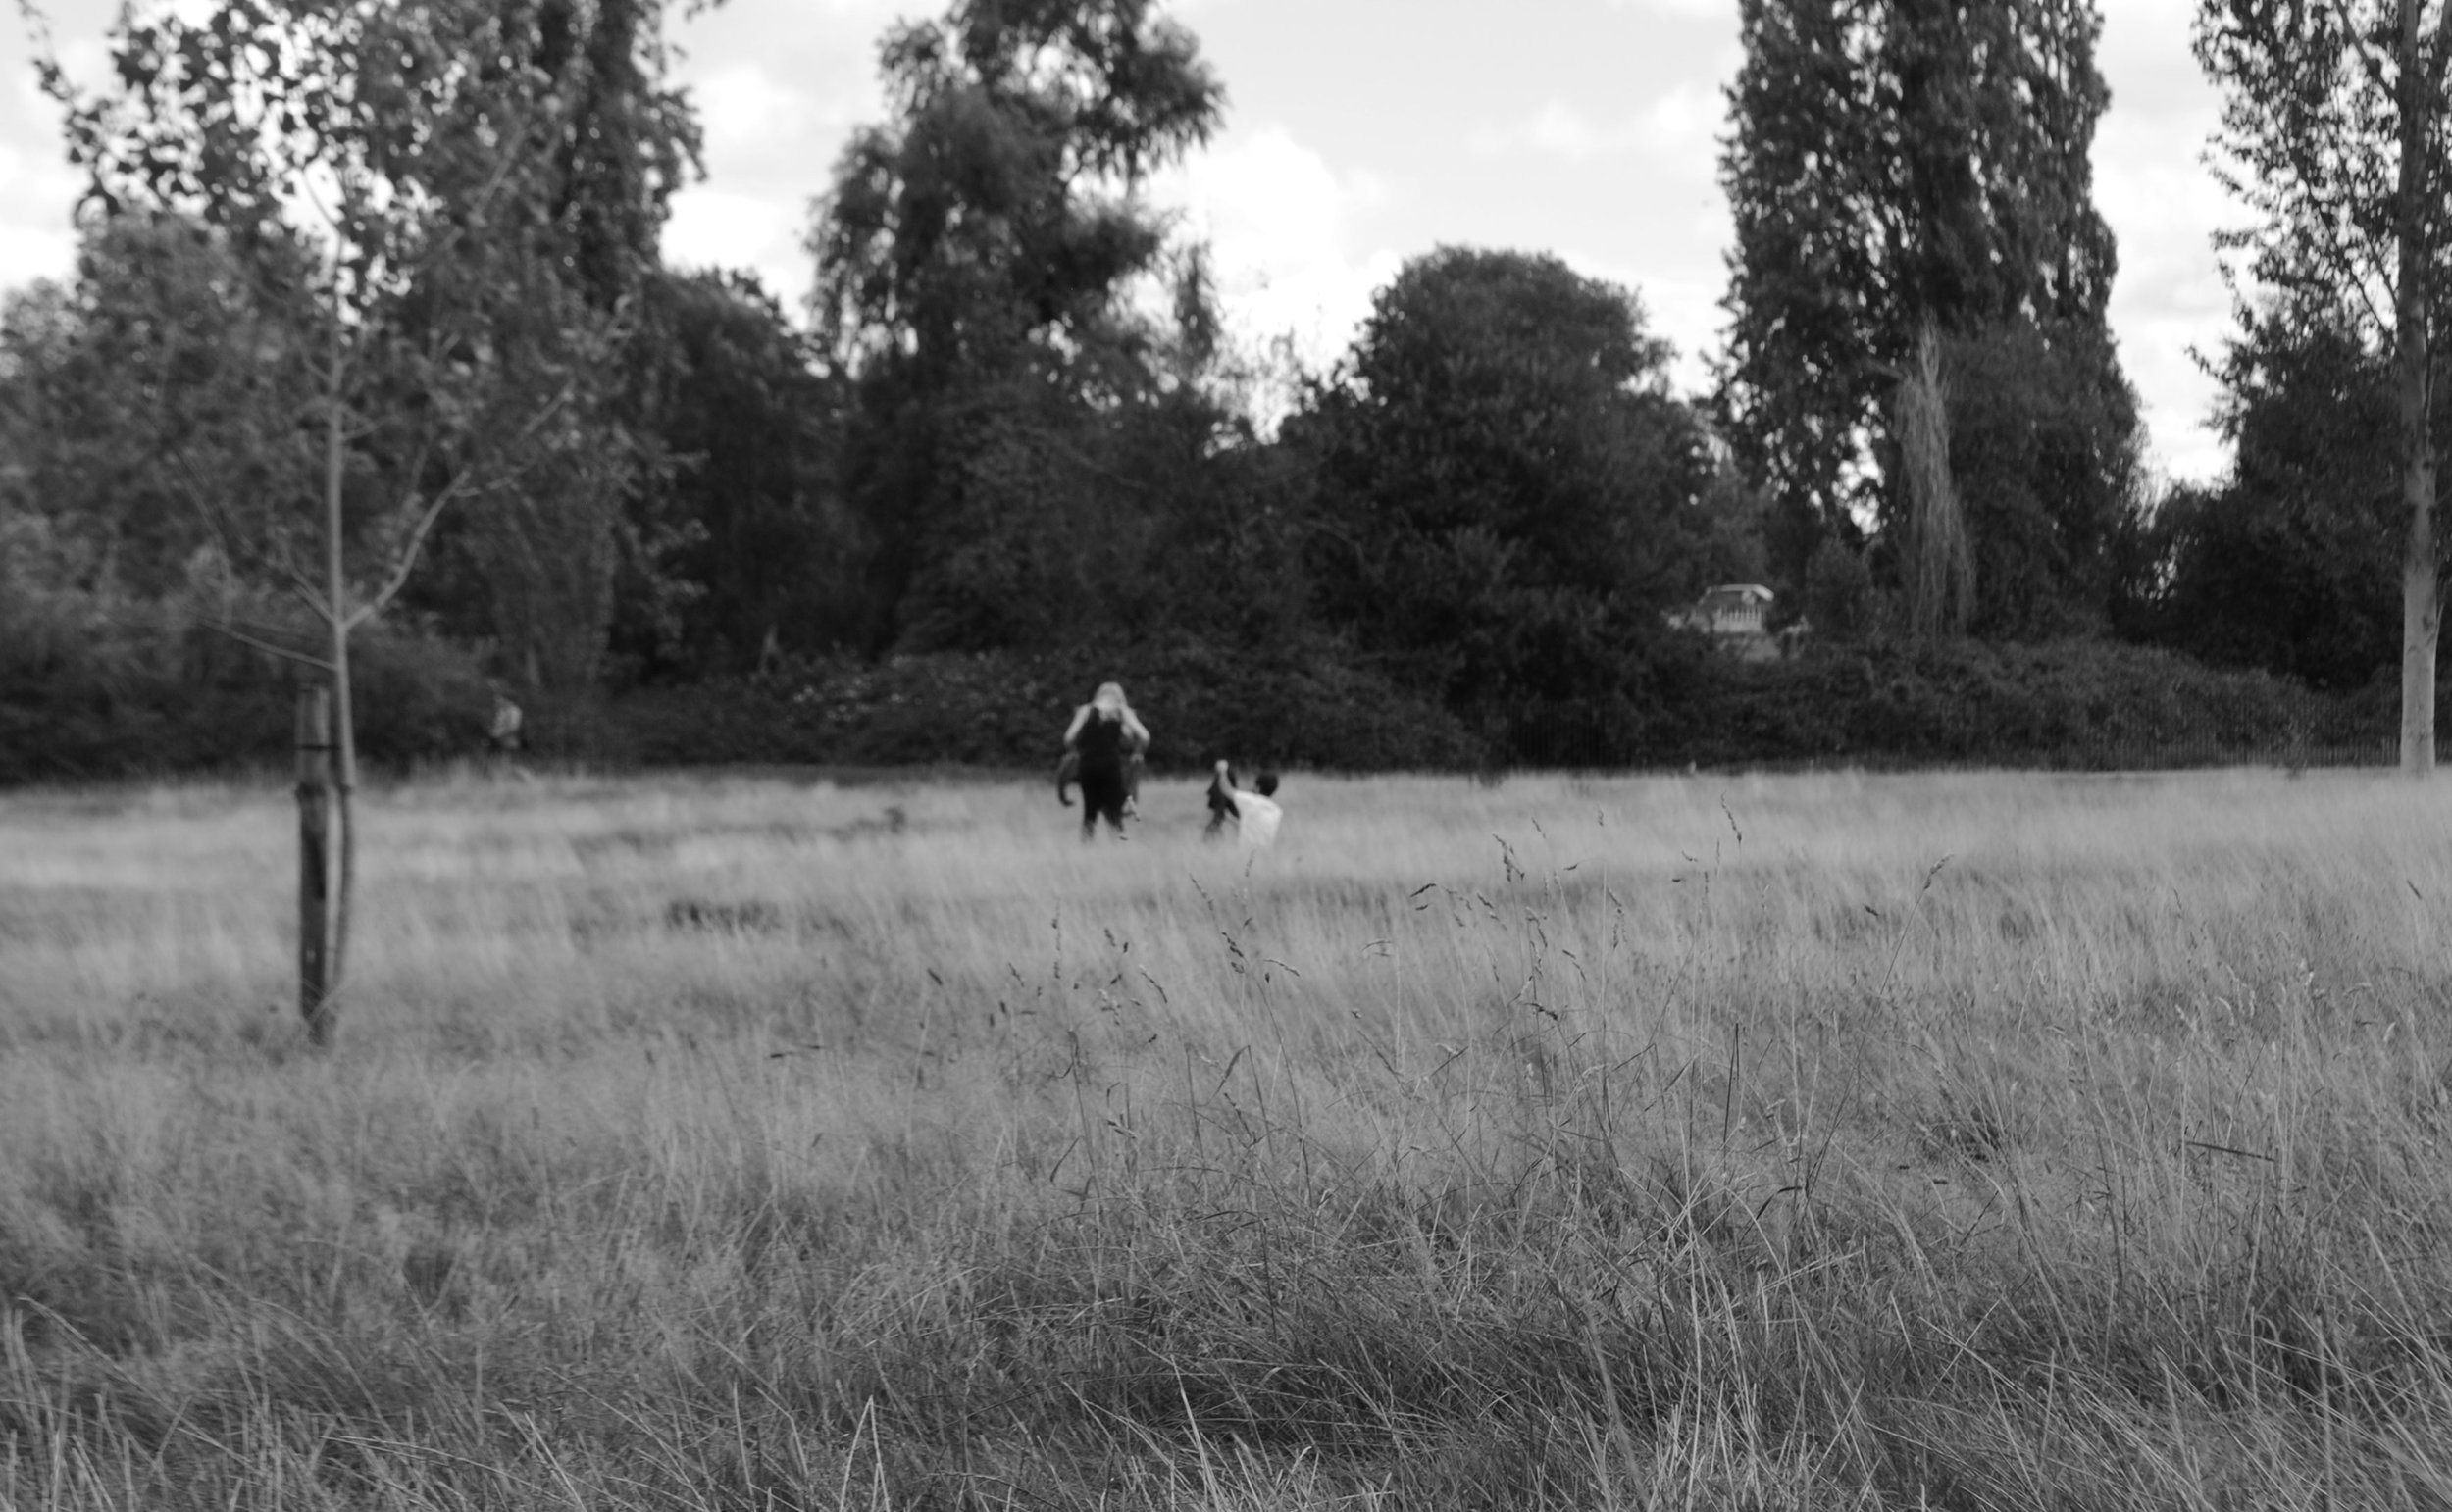 a-couple-in-kensington-park-london.jpg